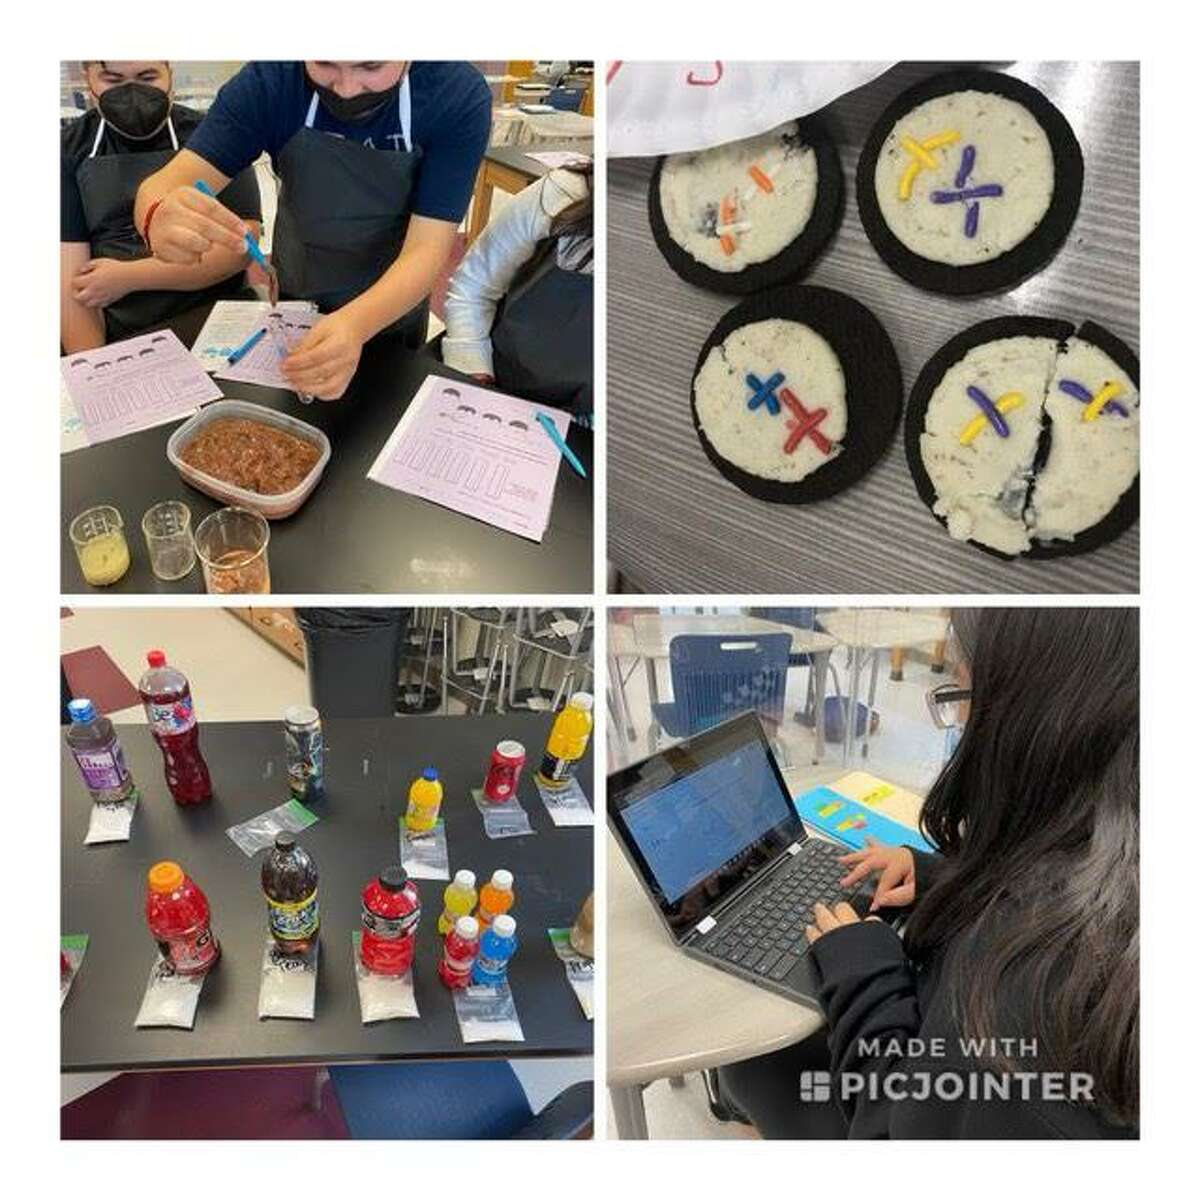 LBJ ninth graders attended an LBJ Jumpstart Program camp to get a head start in learning biology.